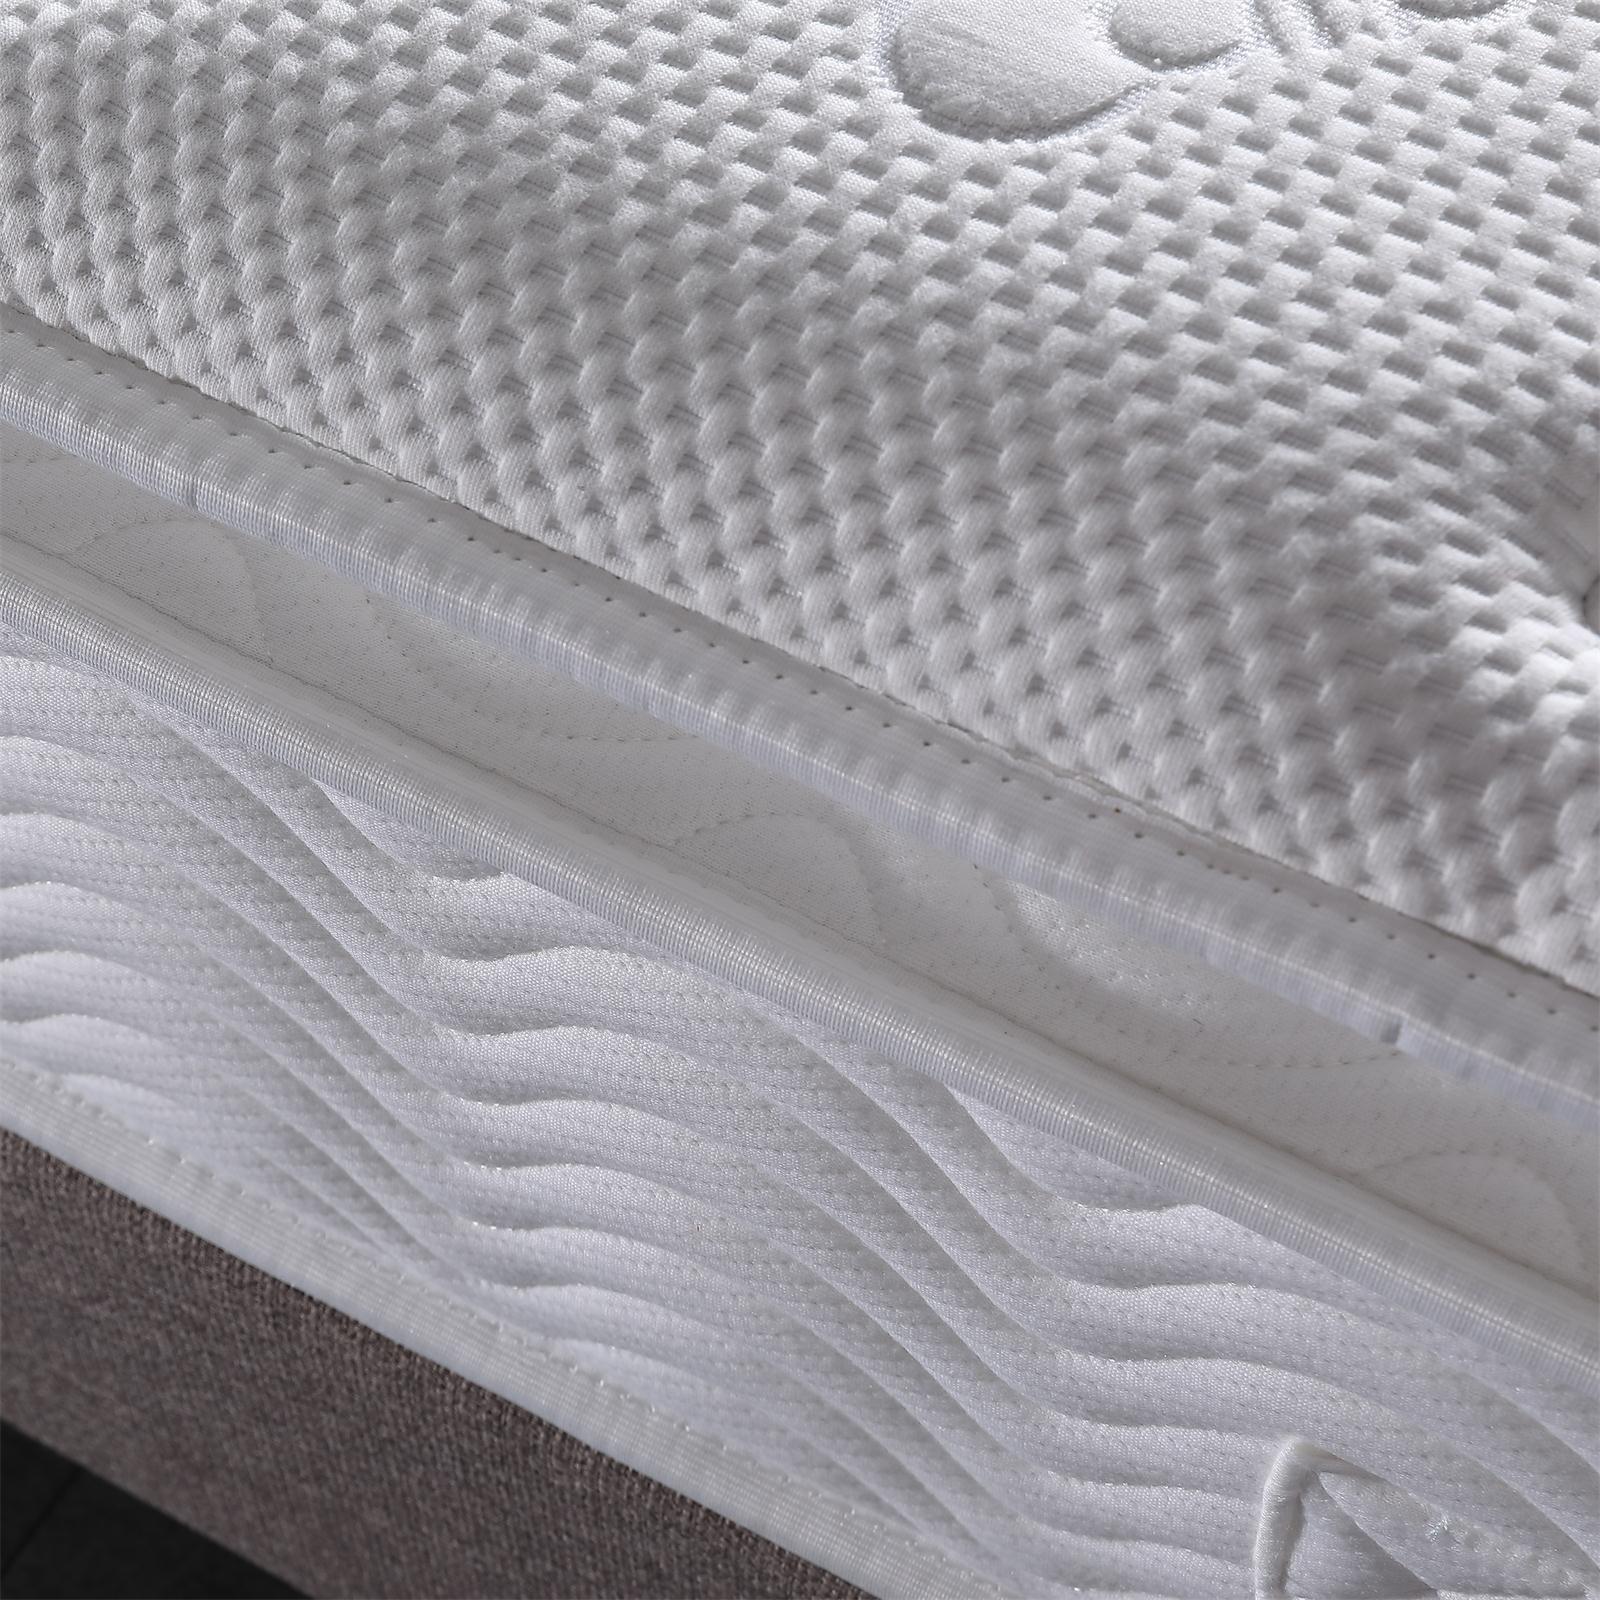 inexpensive platform bed mattress memory price with softness-2